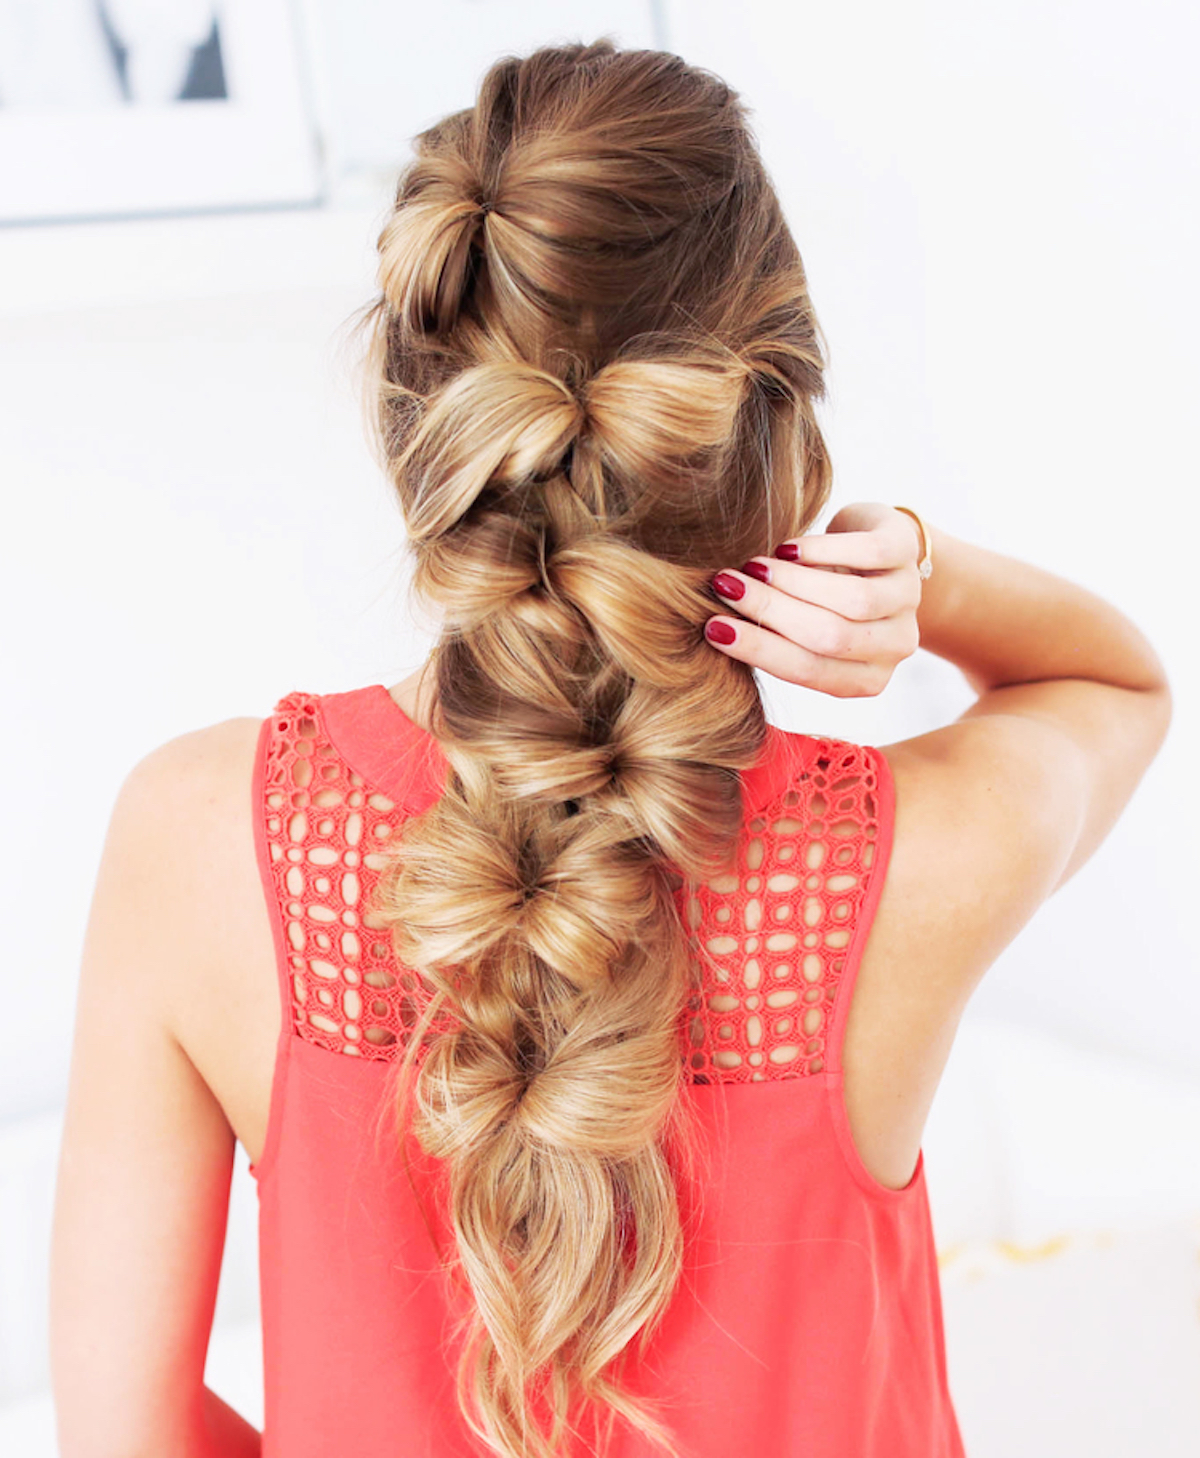 @pfairytale How to make a bohemian bow braid?